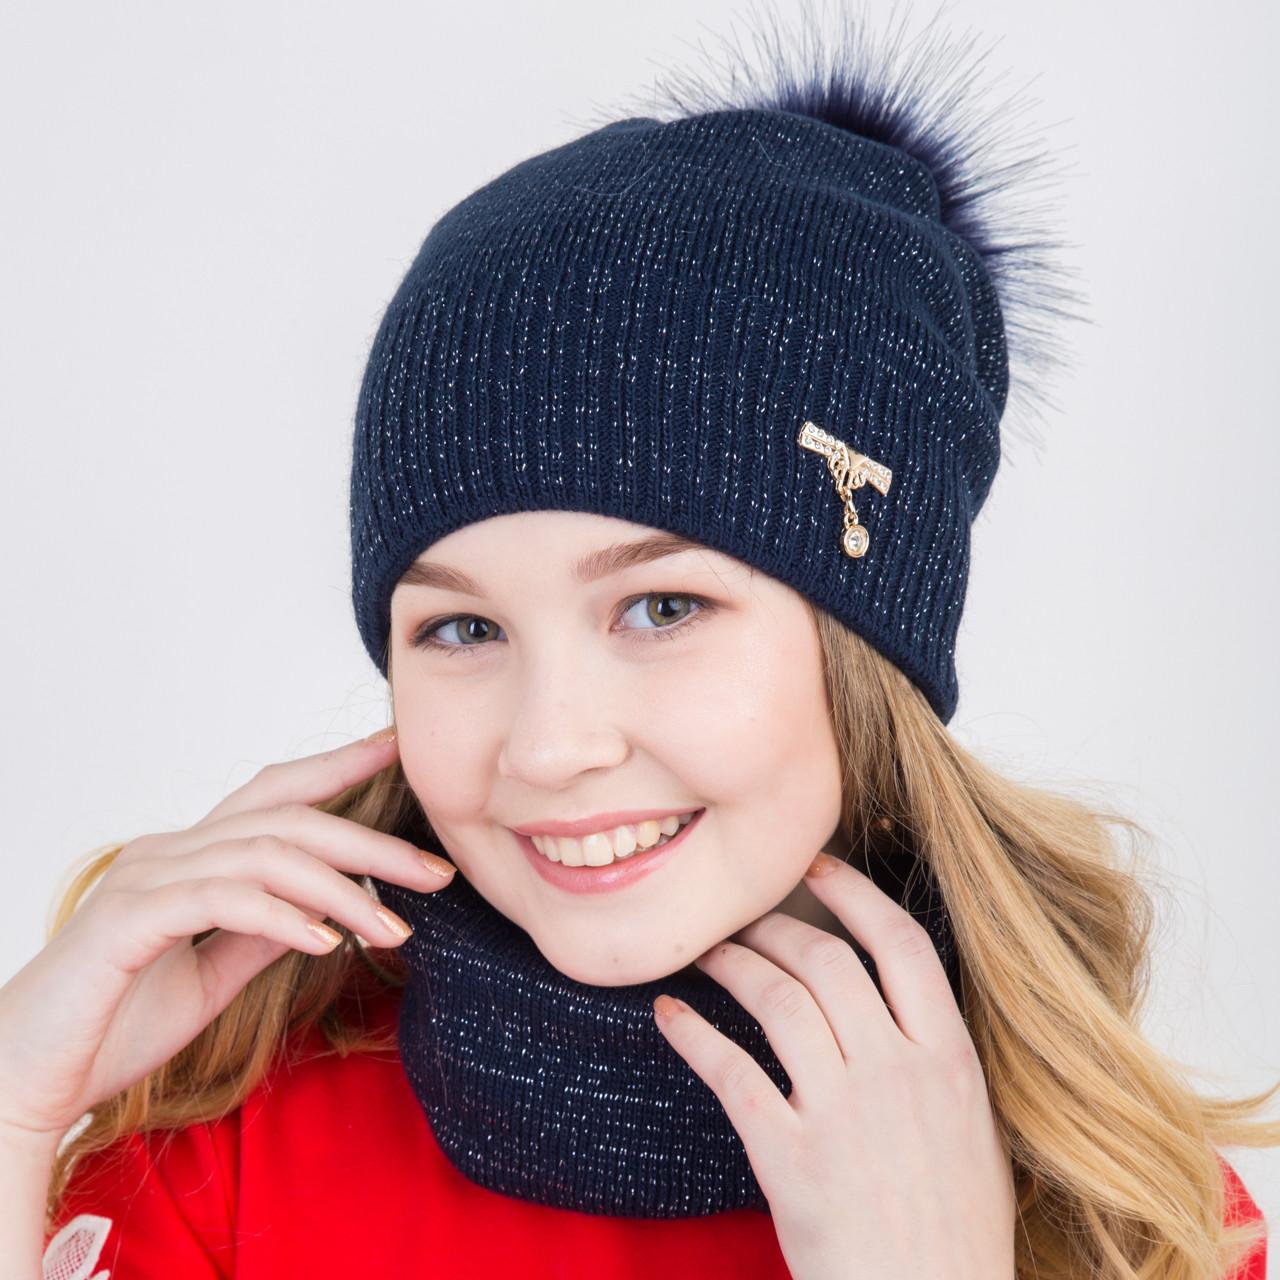 Зимний комплект для девочки (шапка с мехом и хомут) на флисе - Артикул 2182 (синий)